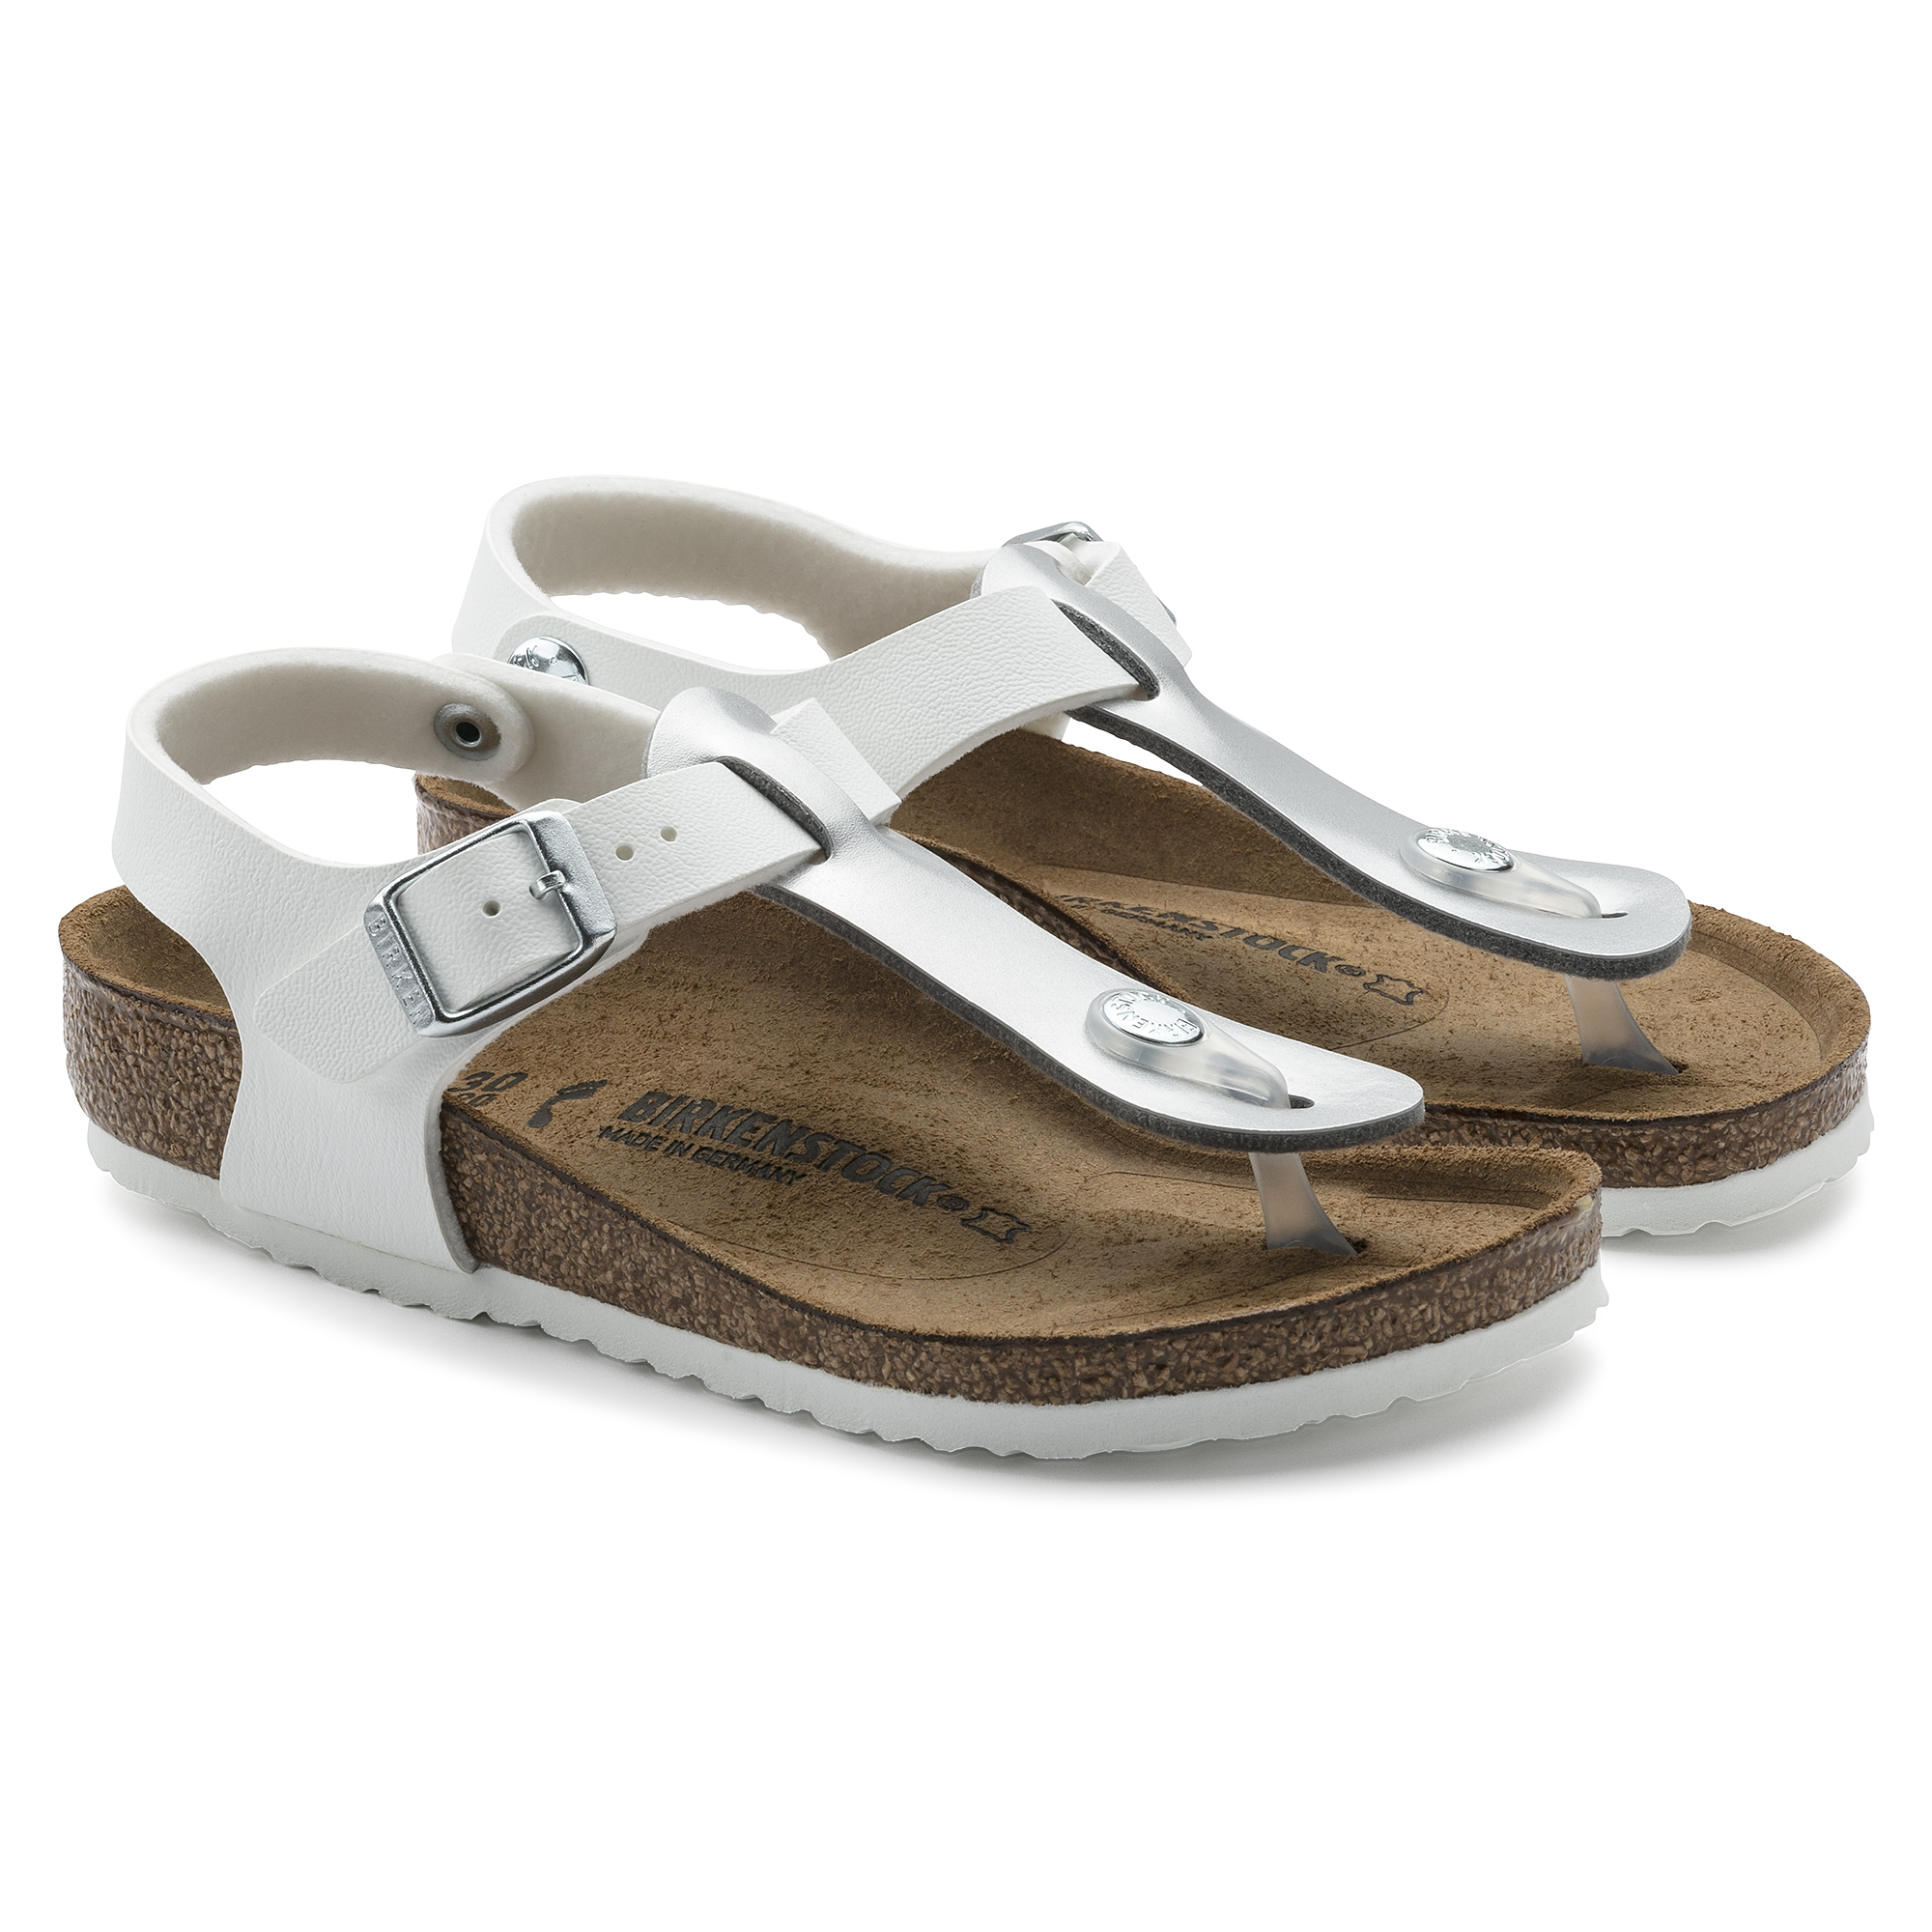 BIRKENSTOCK Kairo Kids Mädchen Sandalen: : Schuhe